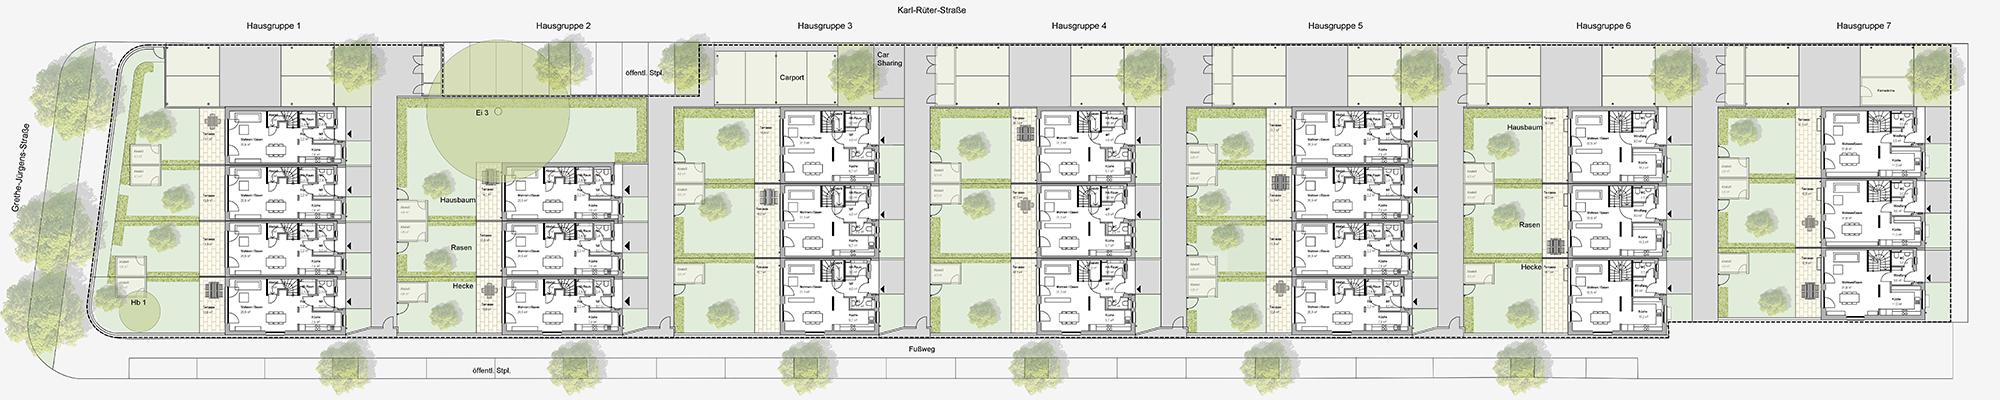 banner-stadthaeuser-lister-blick-wohnanlage-plan